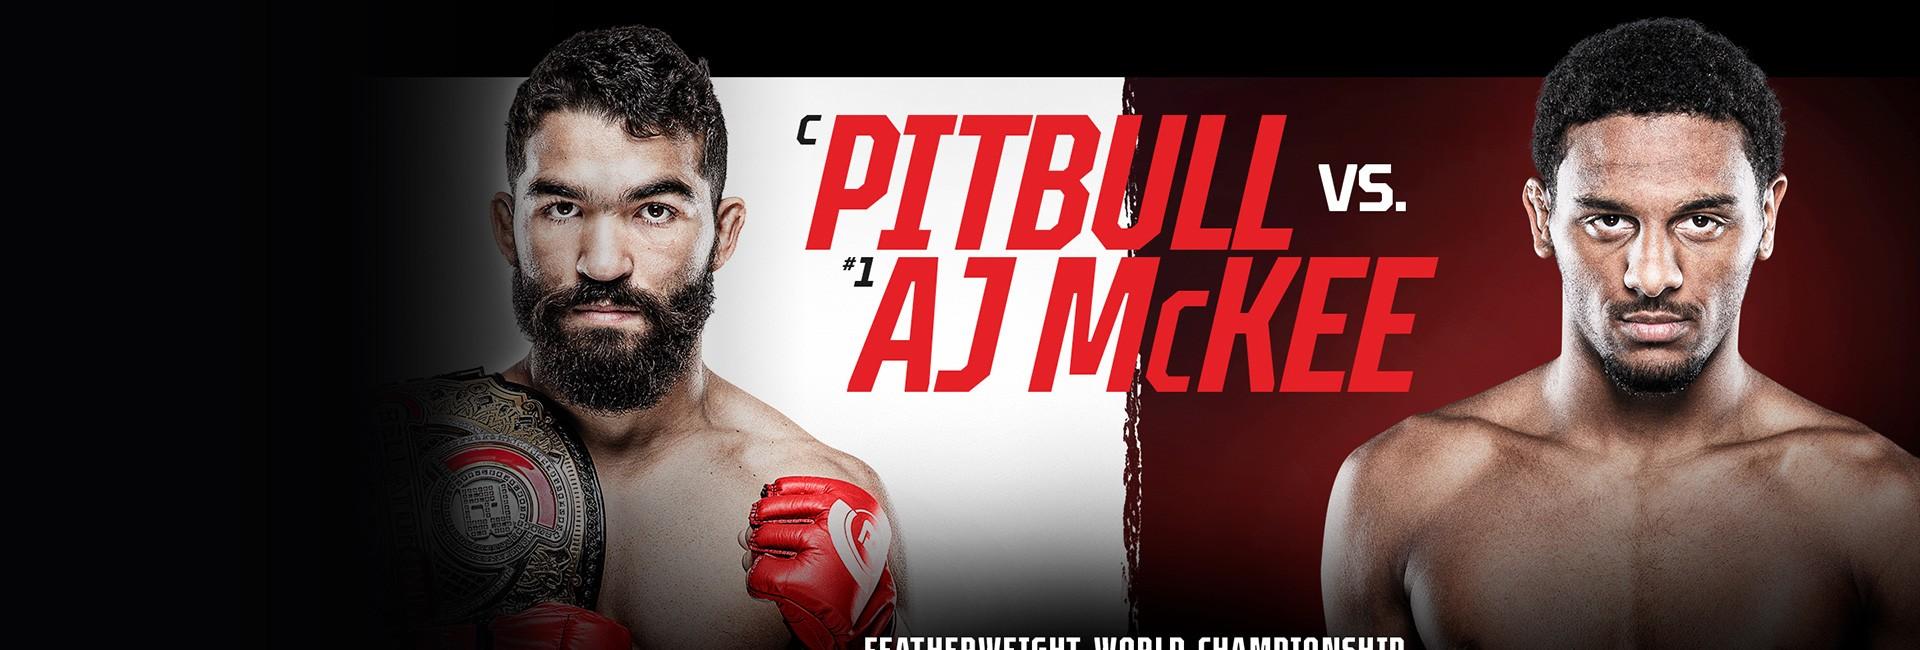 Bellator 263: Pitbull vs. McKee 1. 8. - 01:00